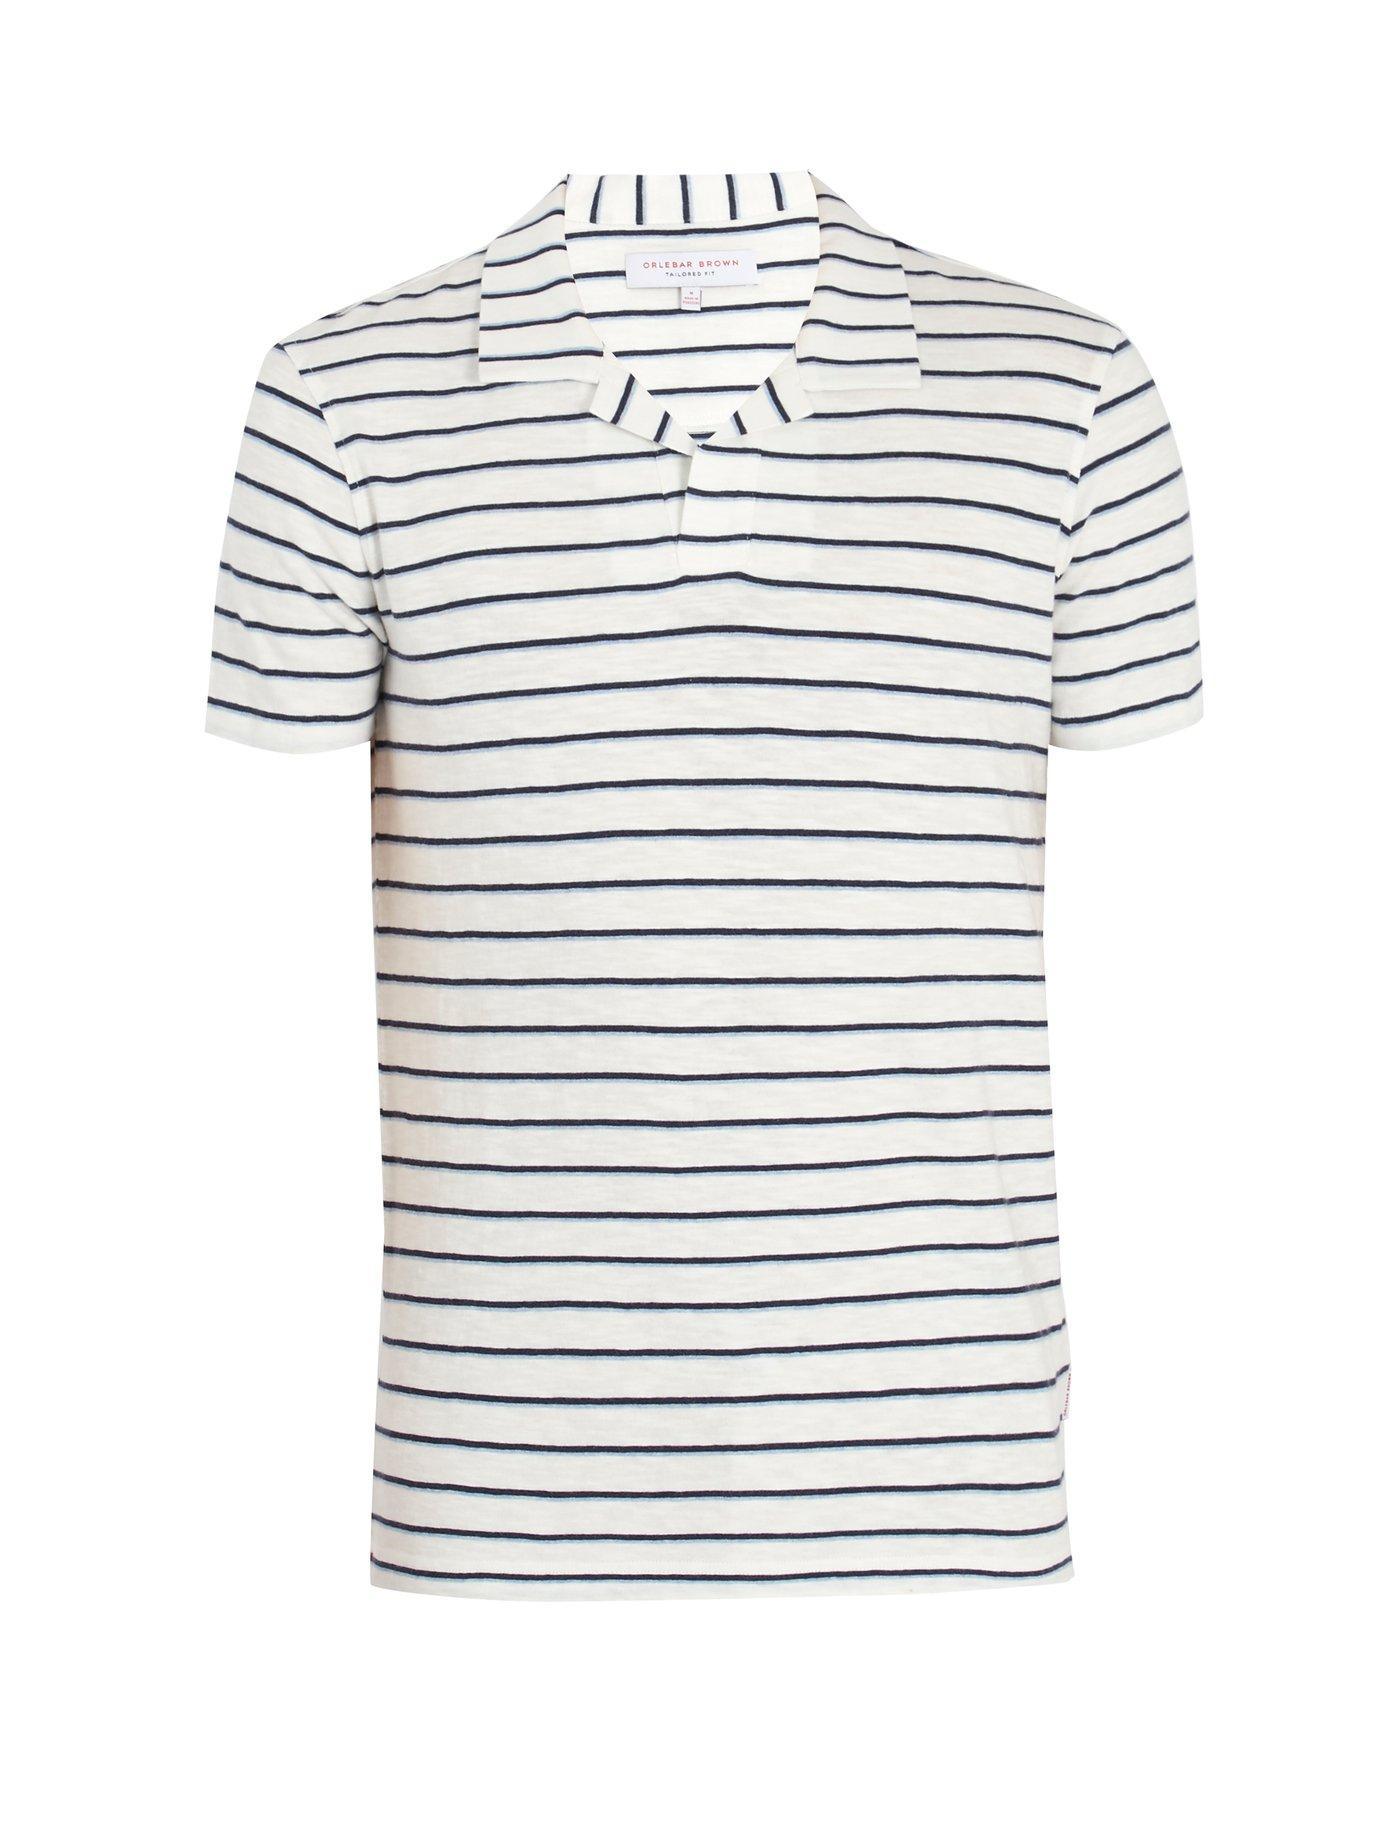 74ed51ea Orlebar Brown Felix Striped Cotton Polo Shirt In White Multi | ModeSens